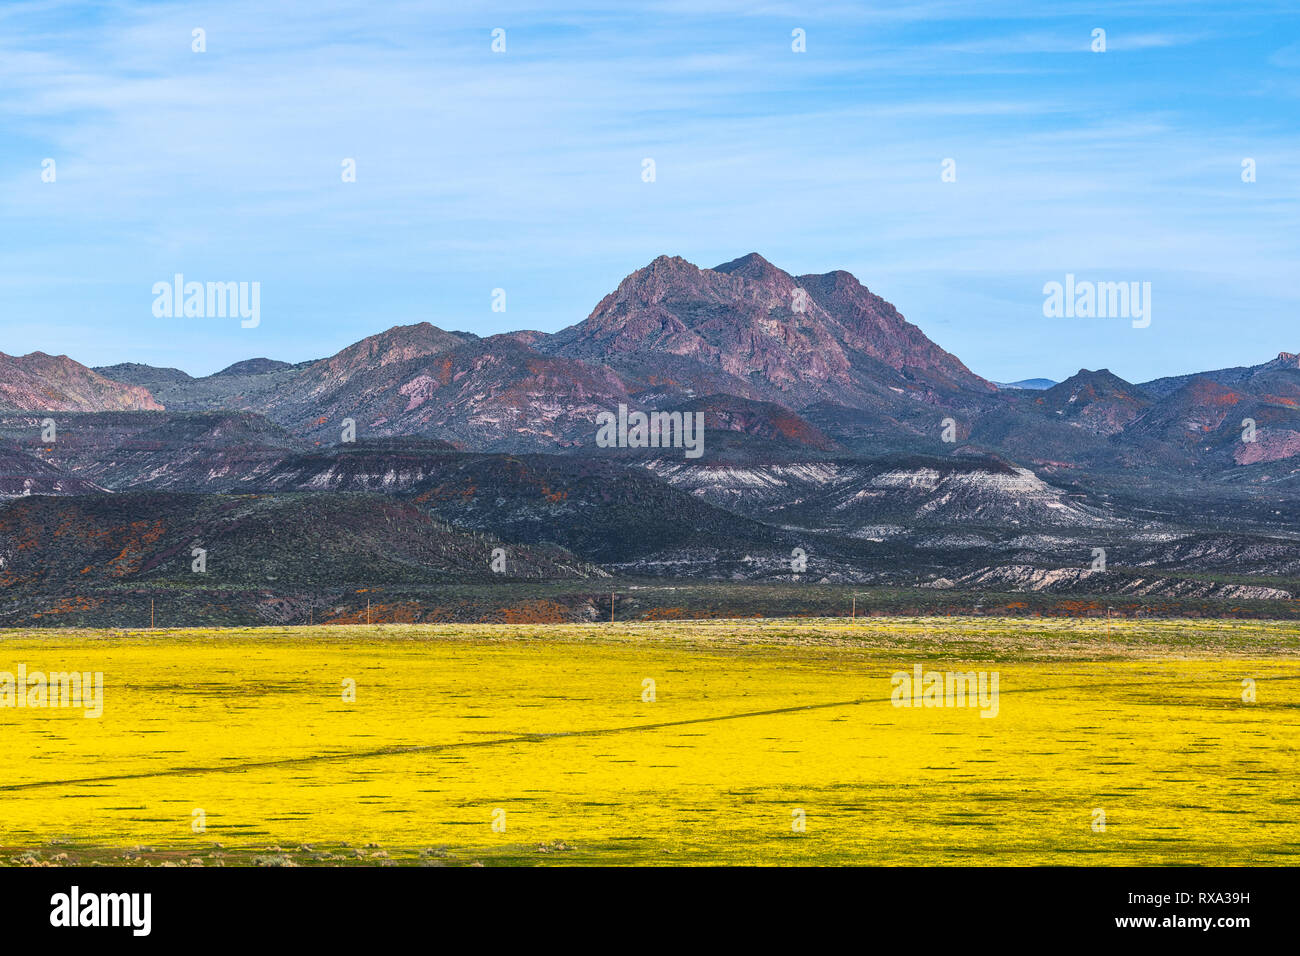 Spring wildflowers cover the desert floor on Peridot Mesa near San Carlos, Arizona, USA. - Stock Image